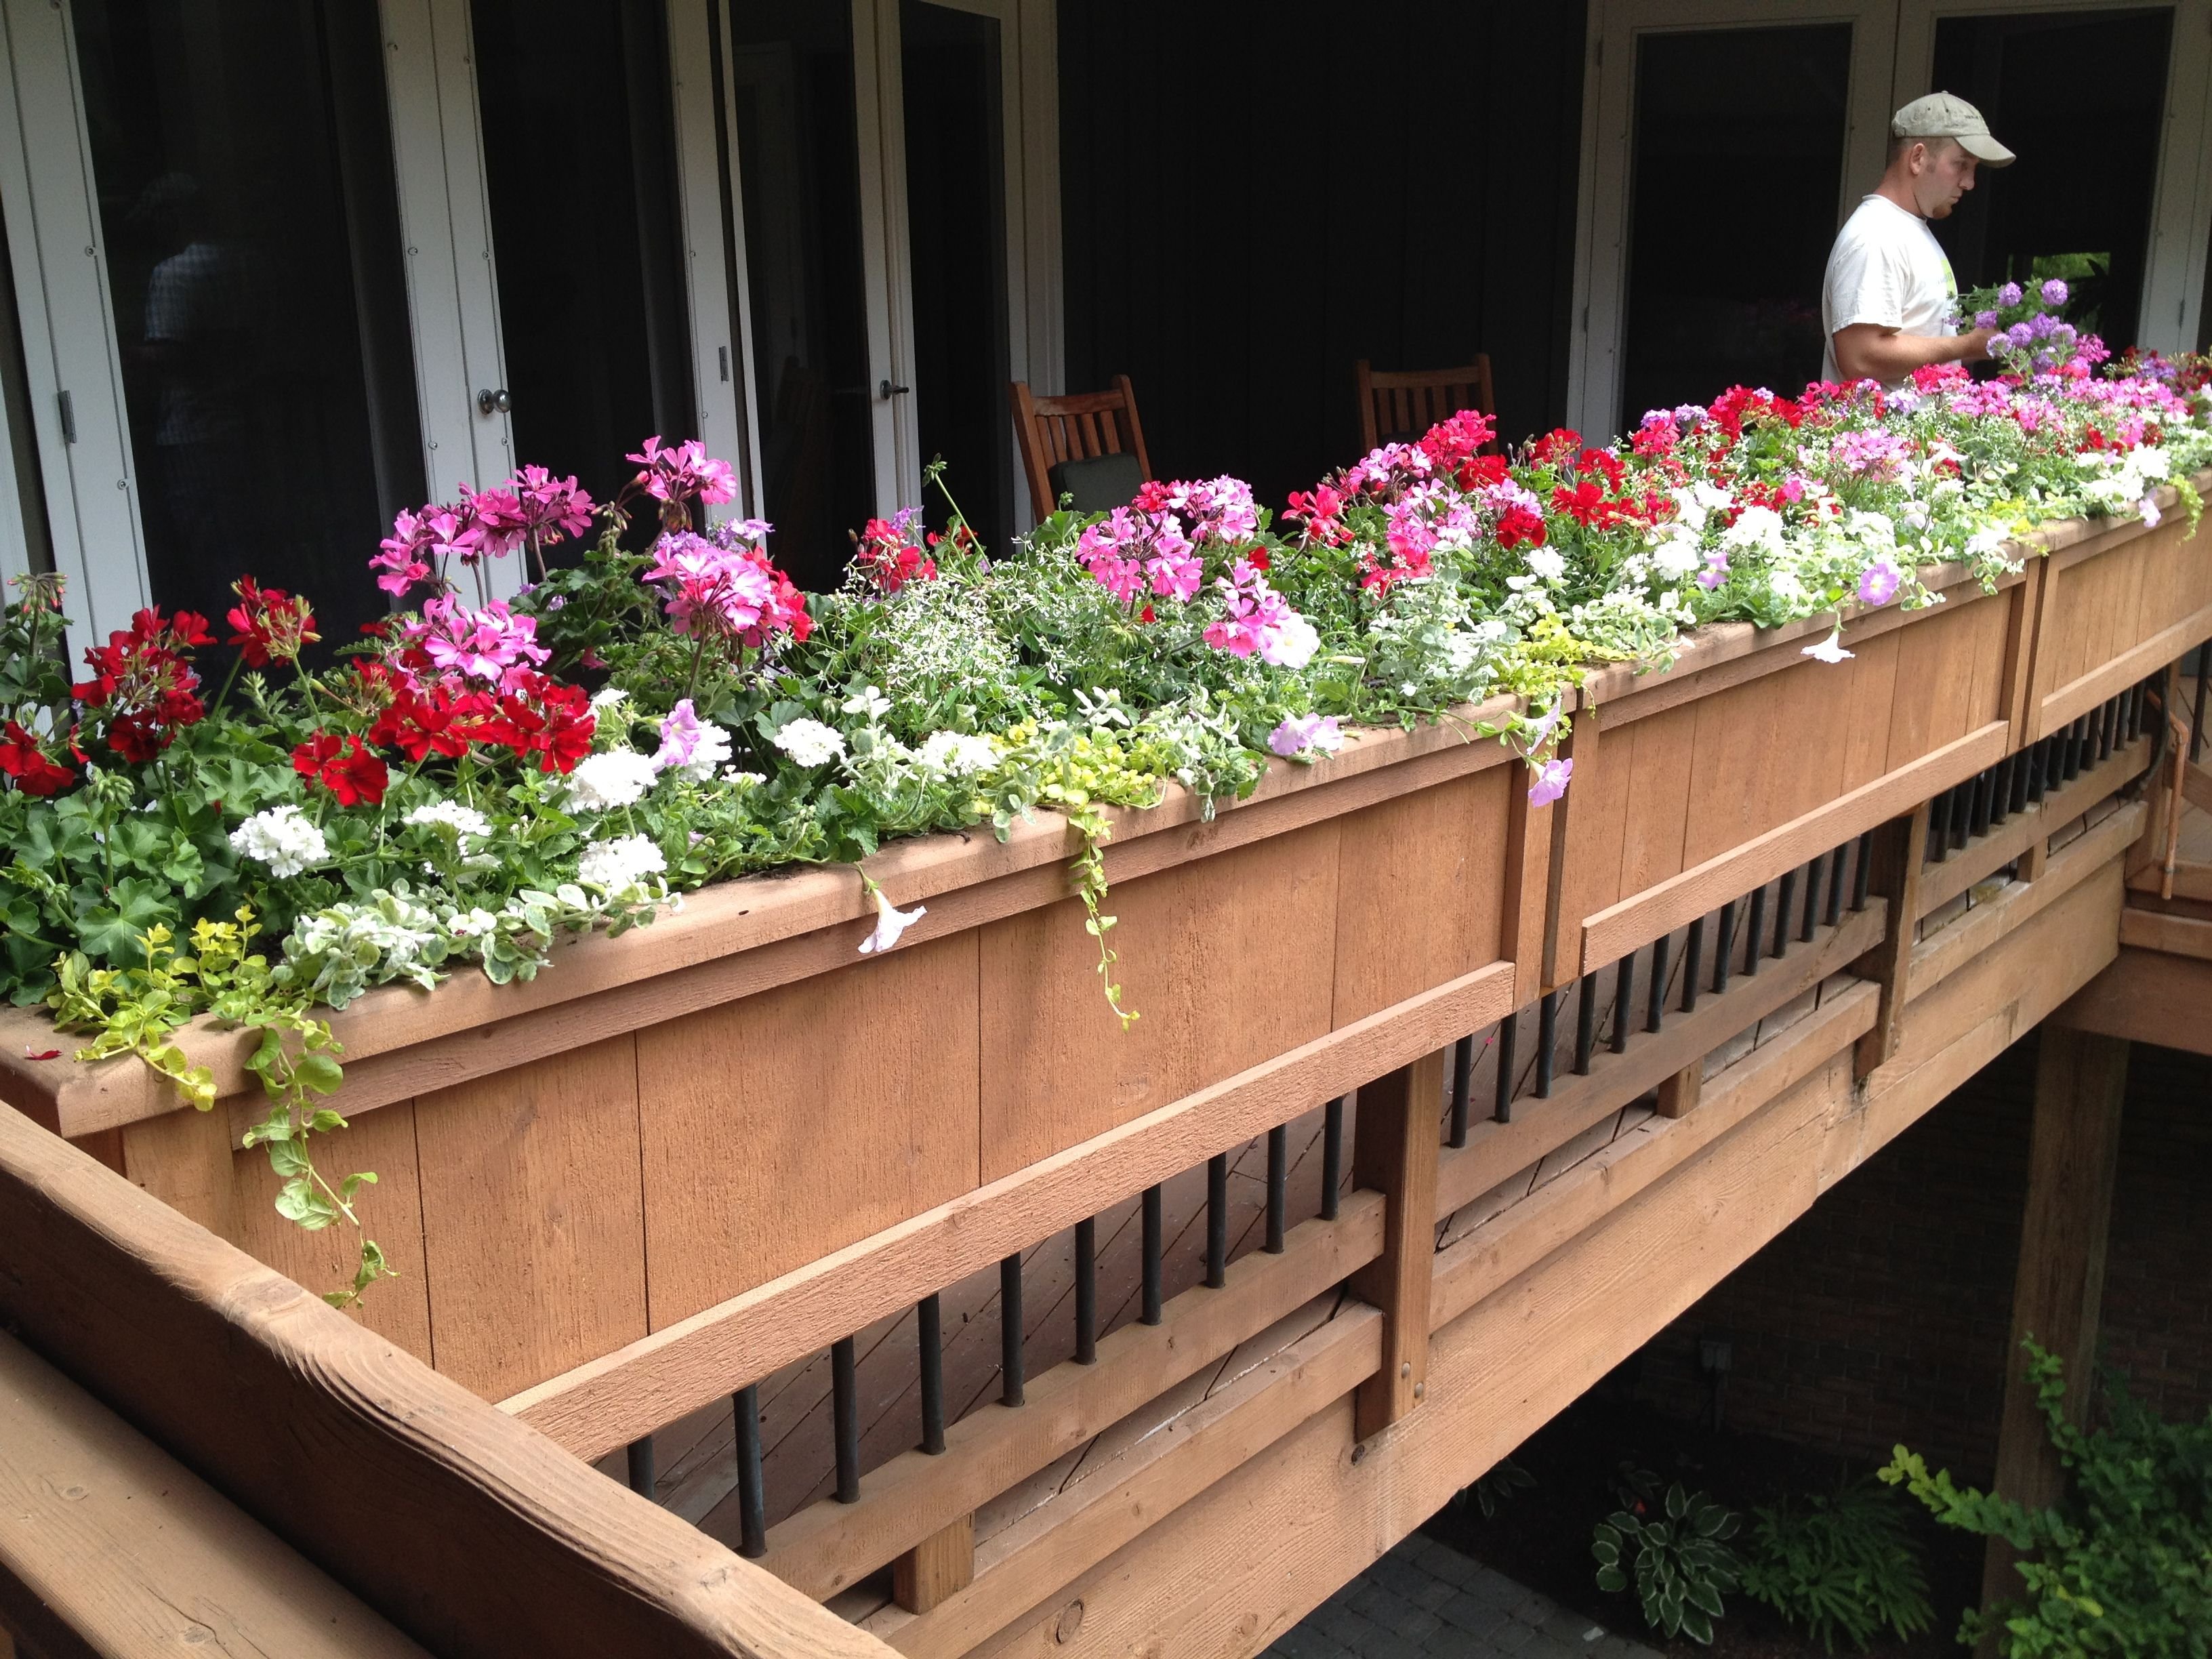 Annual Plantings Dirt Simple Deck Railing Planters Deck